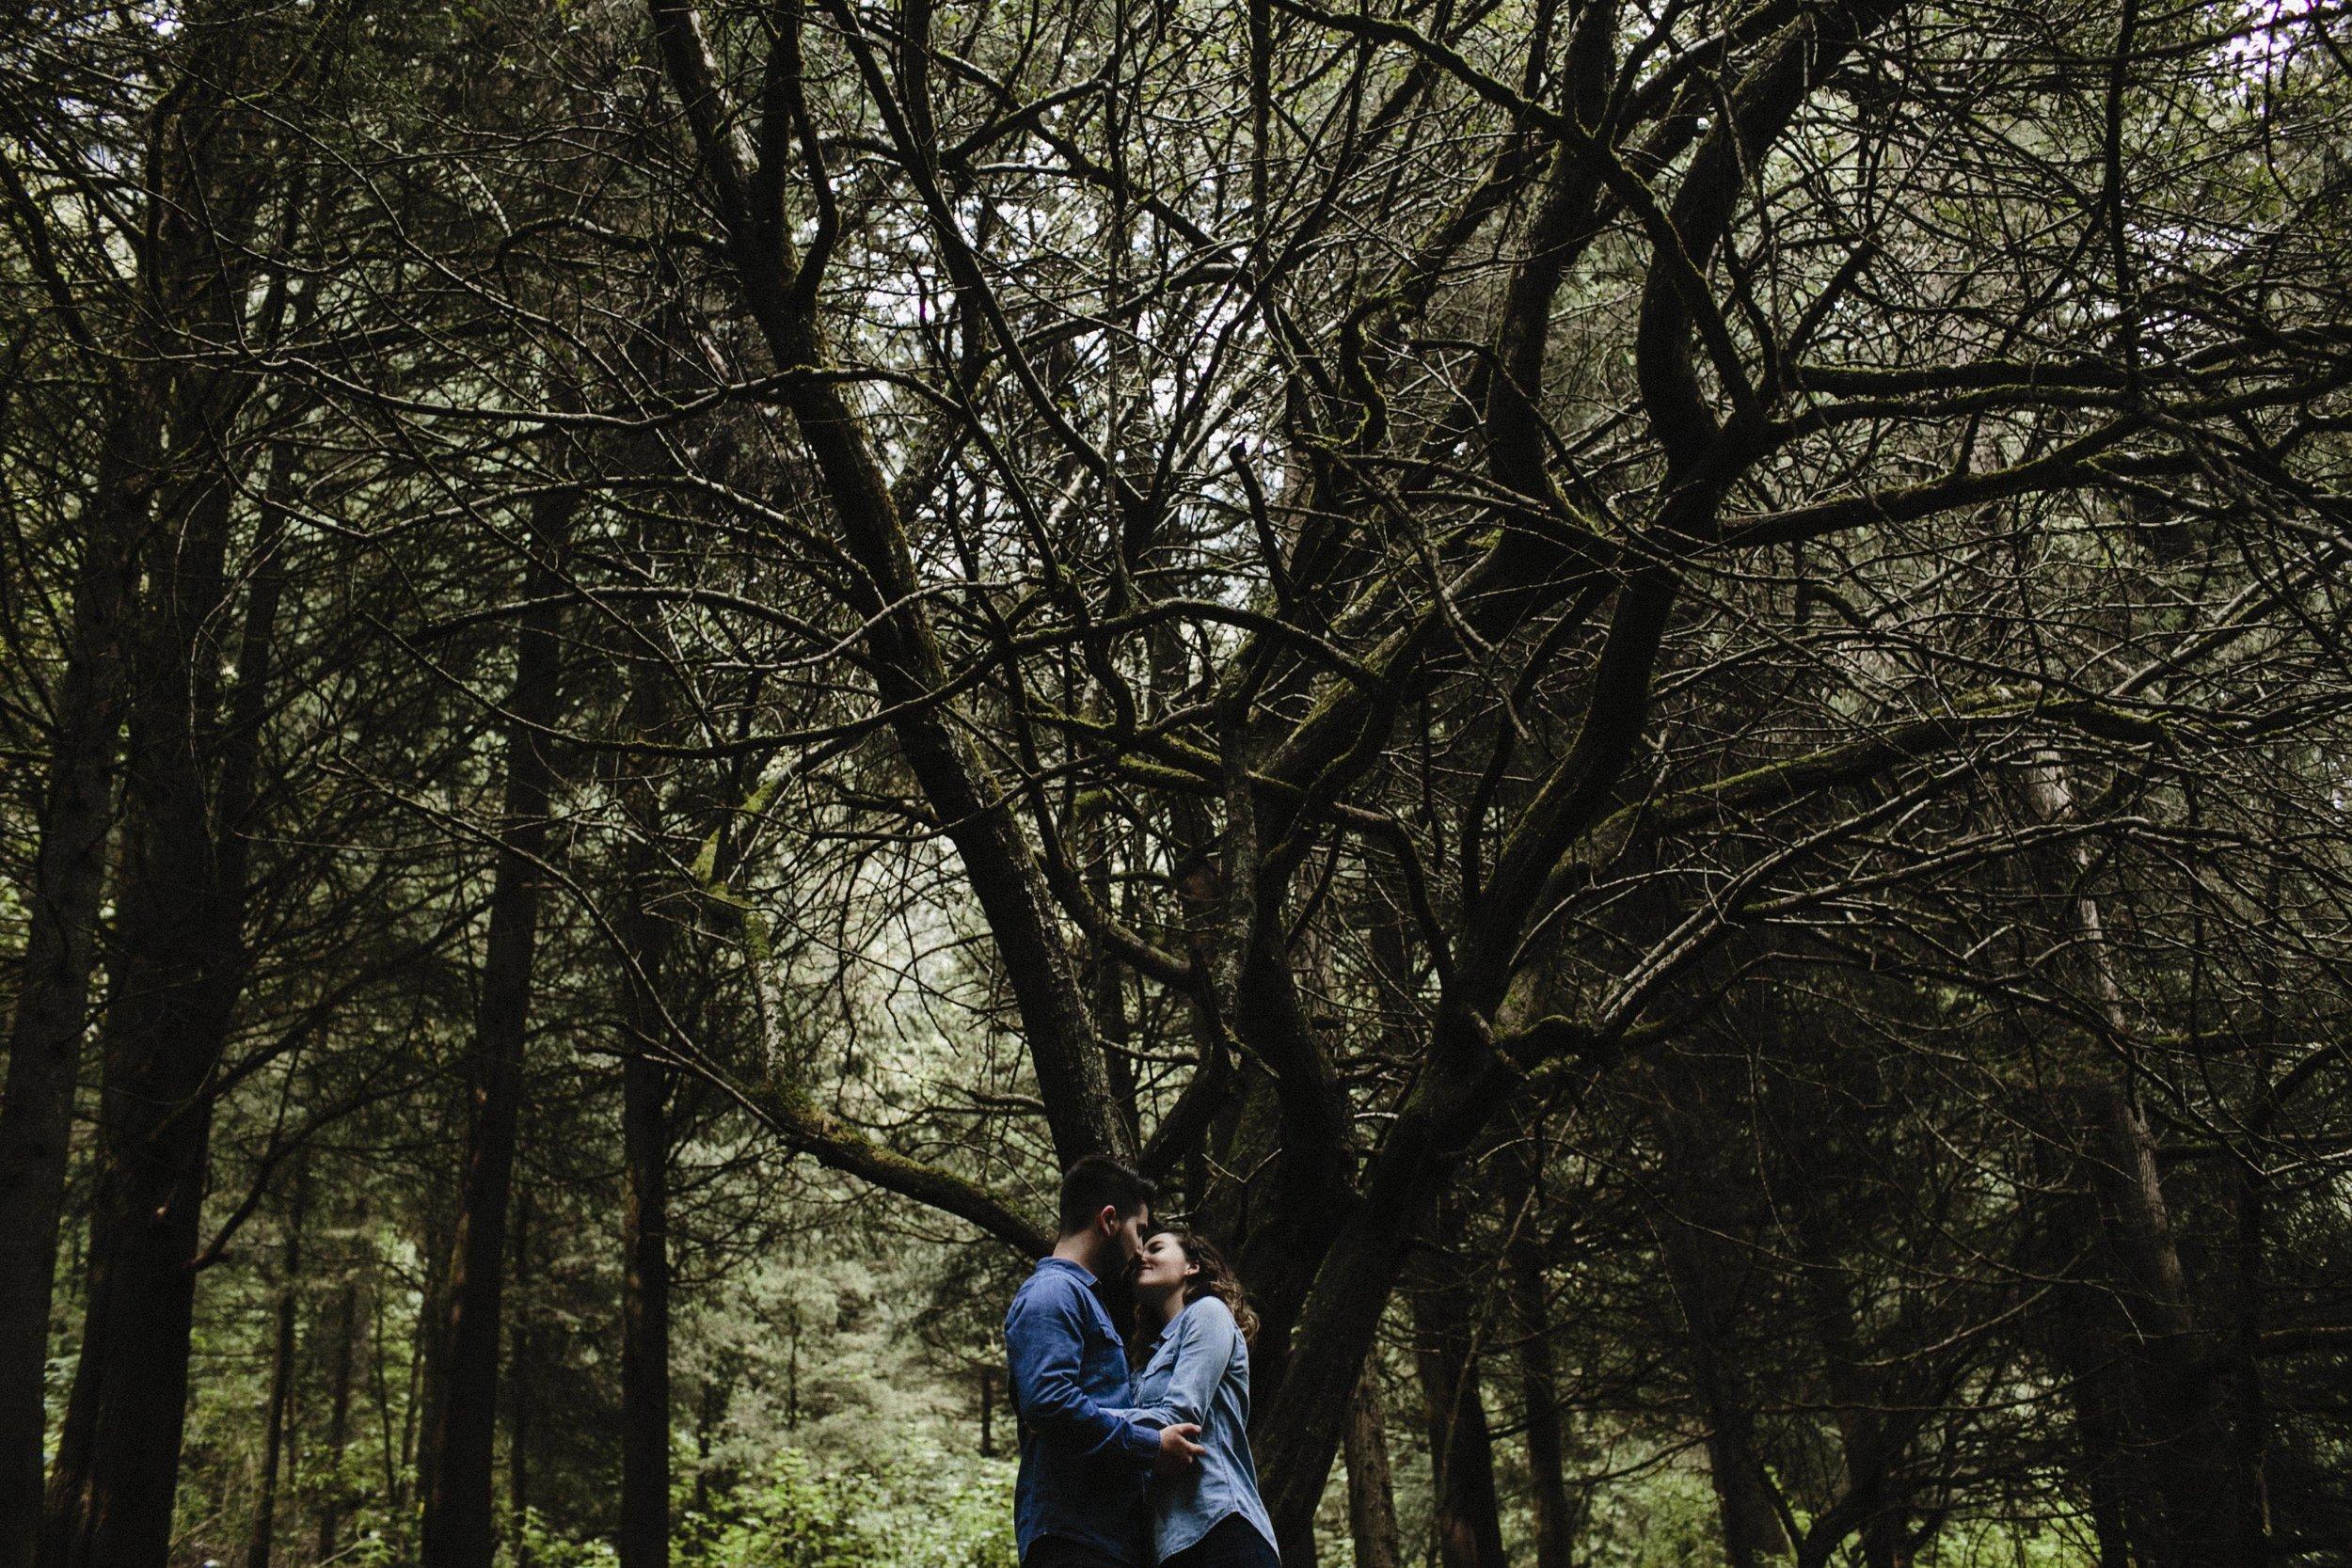 alfonso_flores_destination_wedding_photography_jardin_amarello_cuernavaca106.jpg